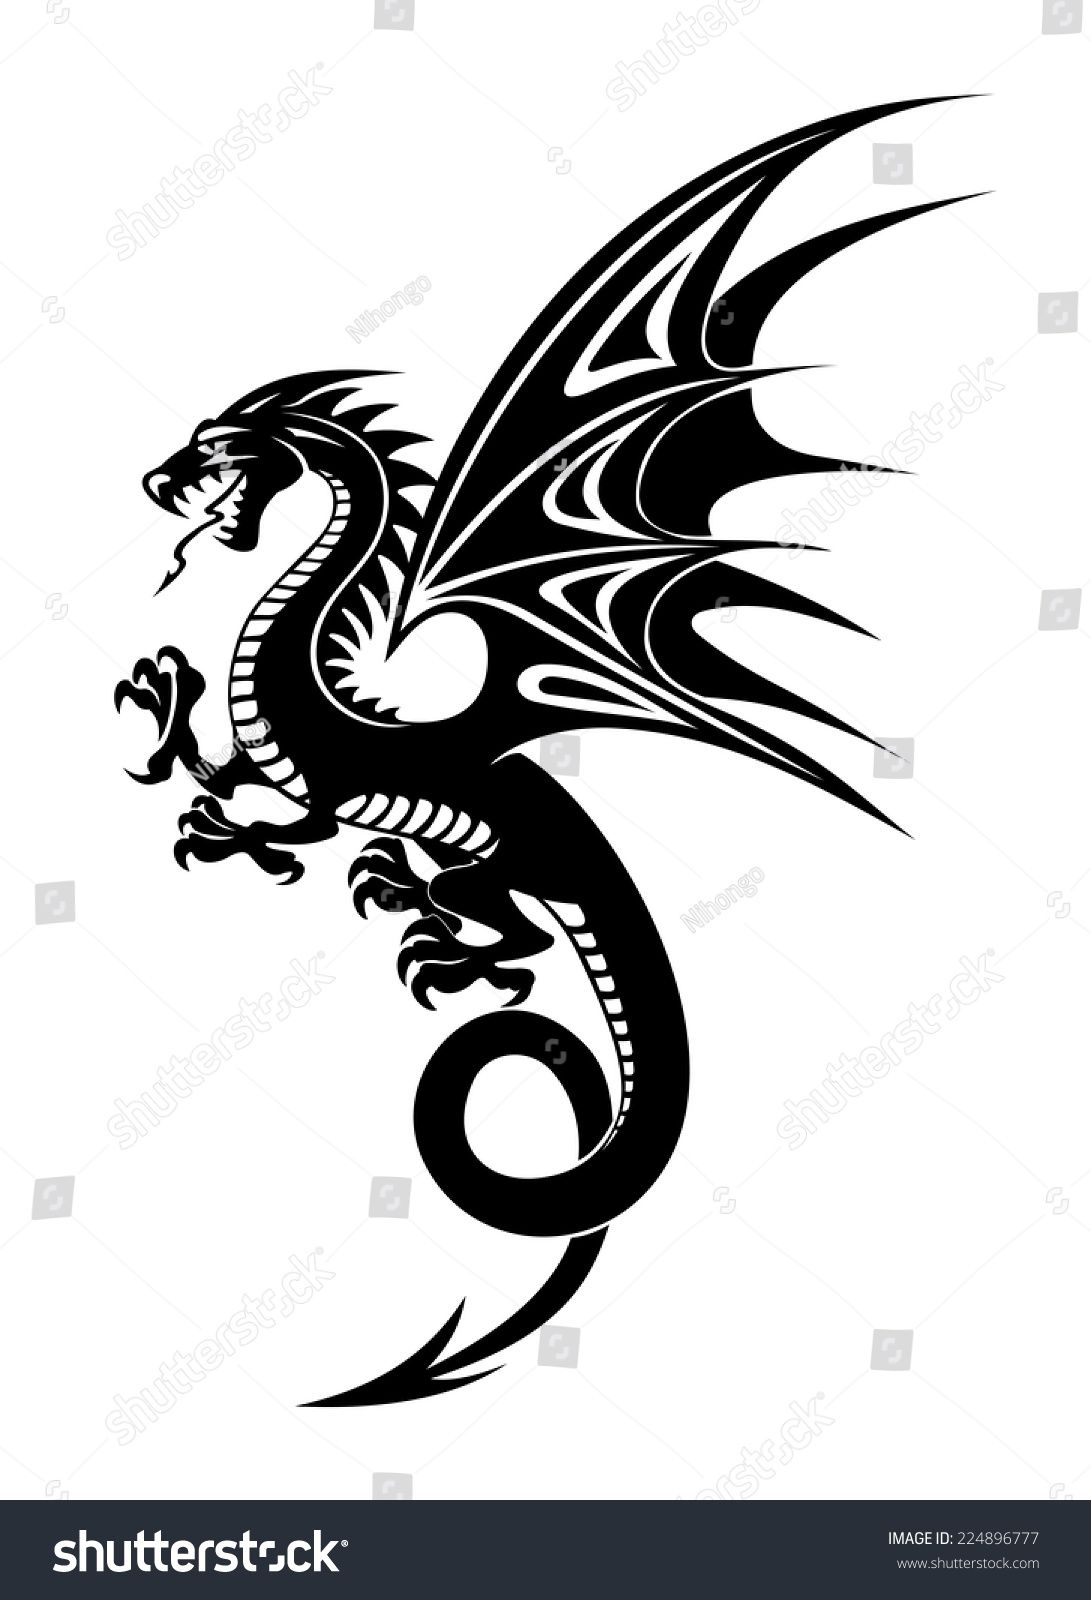 Black danger dragon isolated on white background. Vector